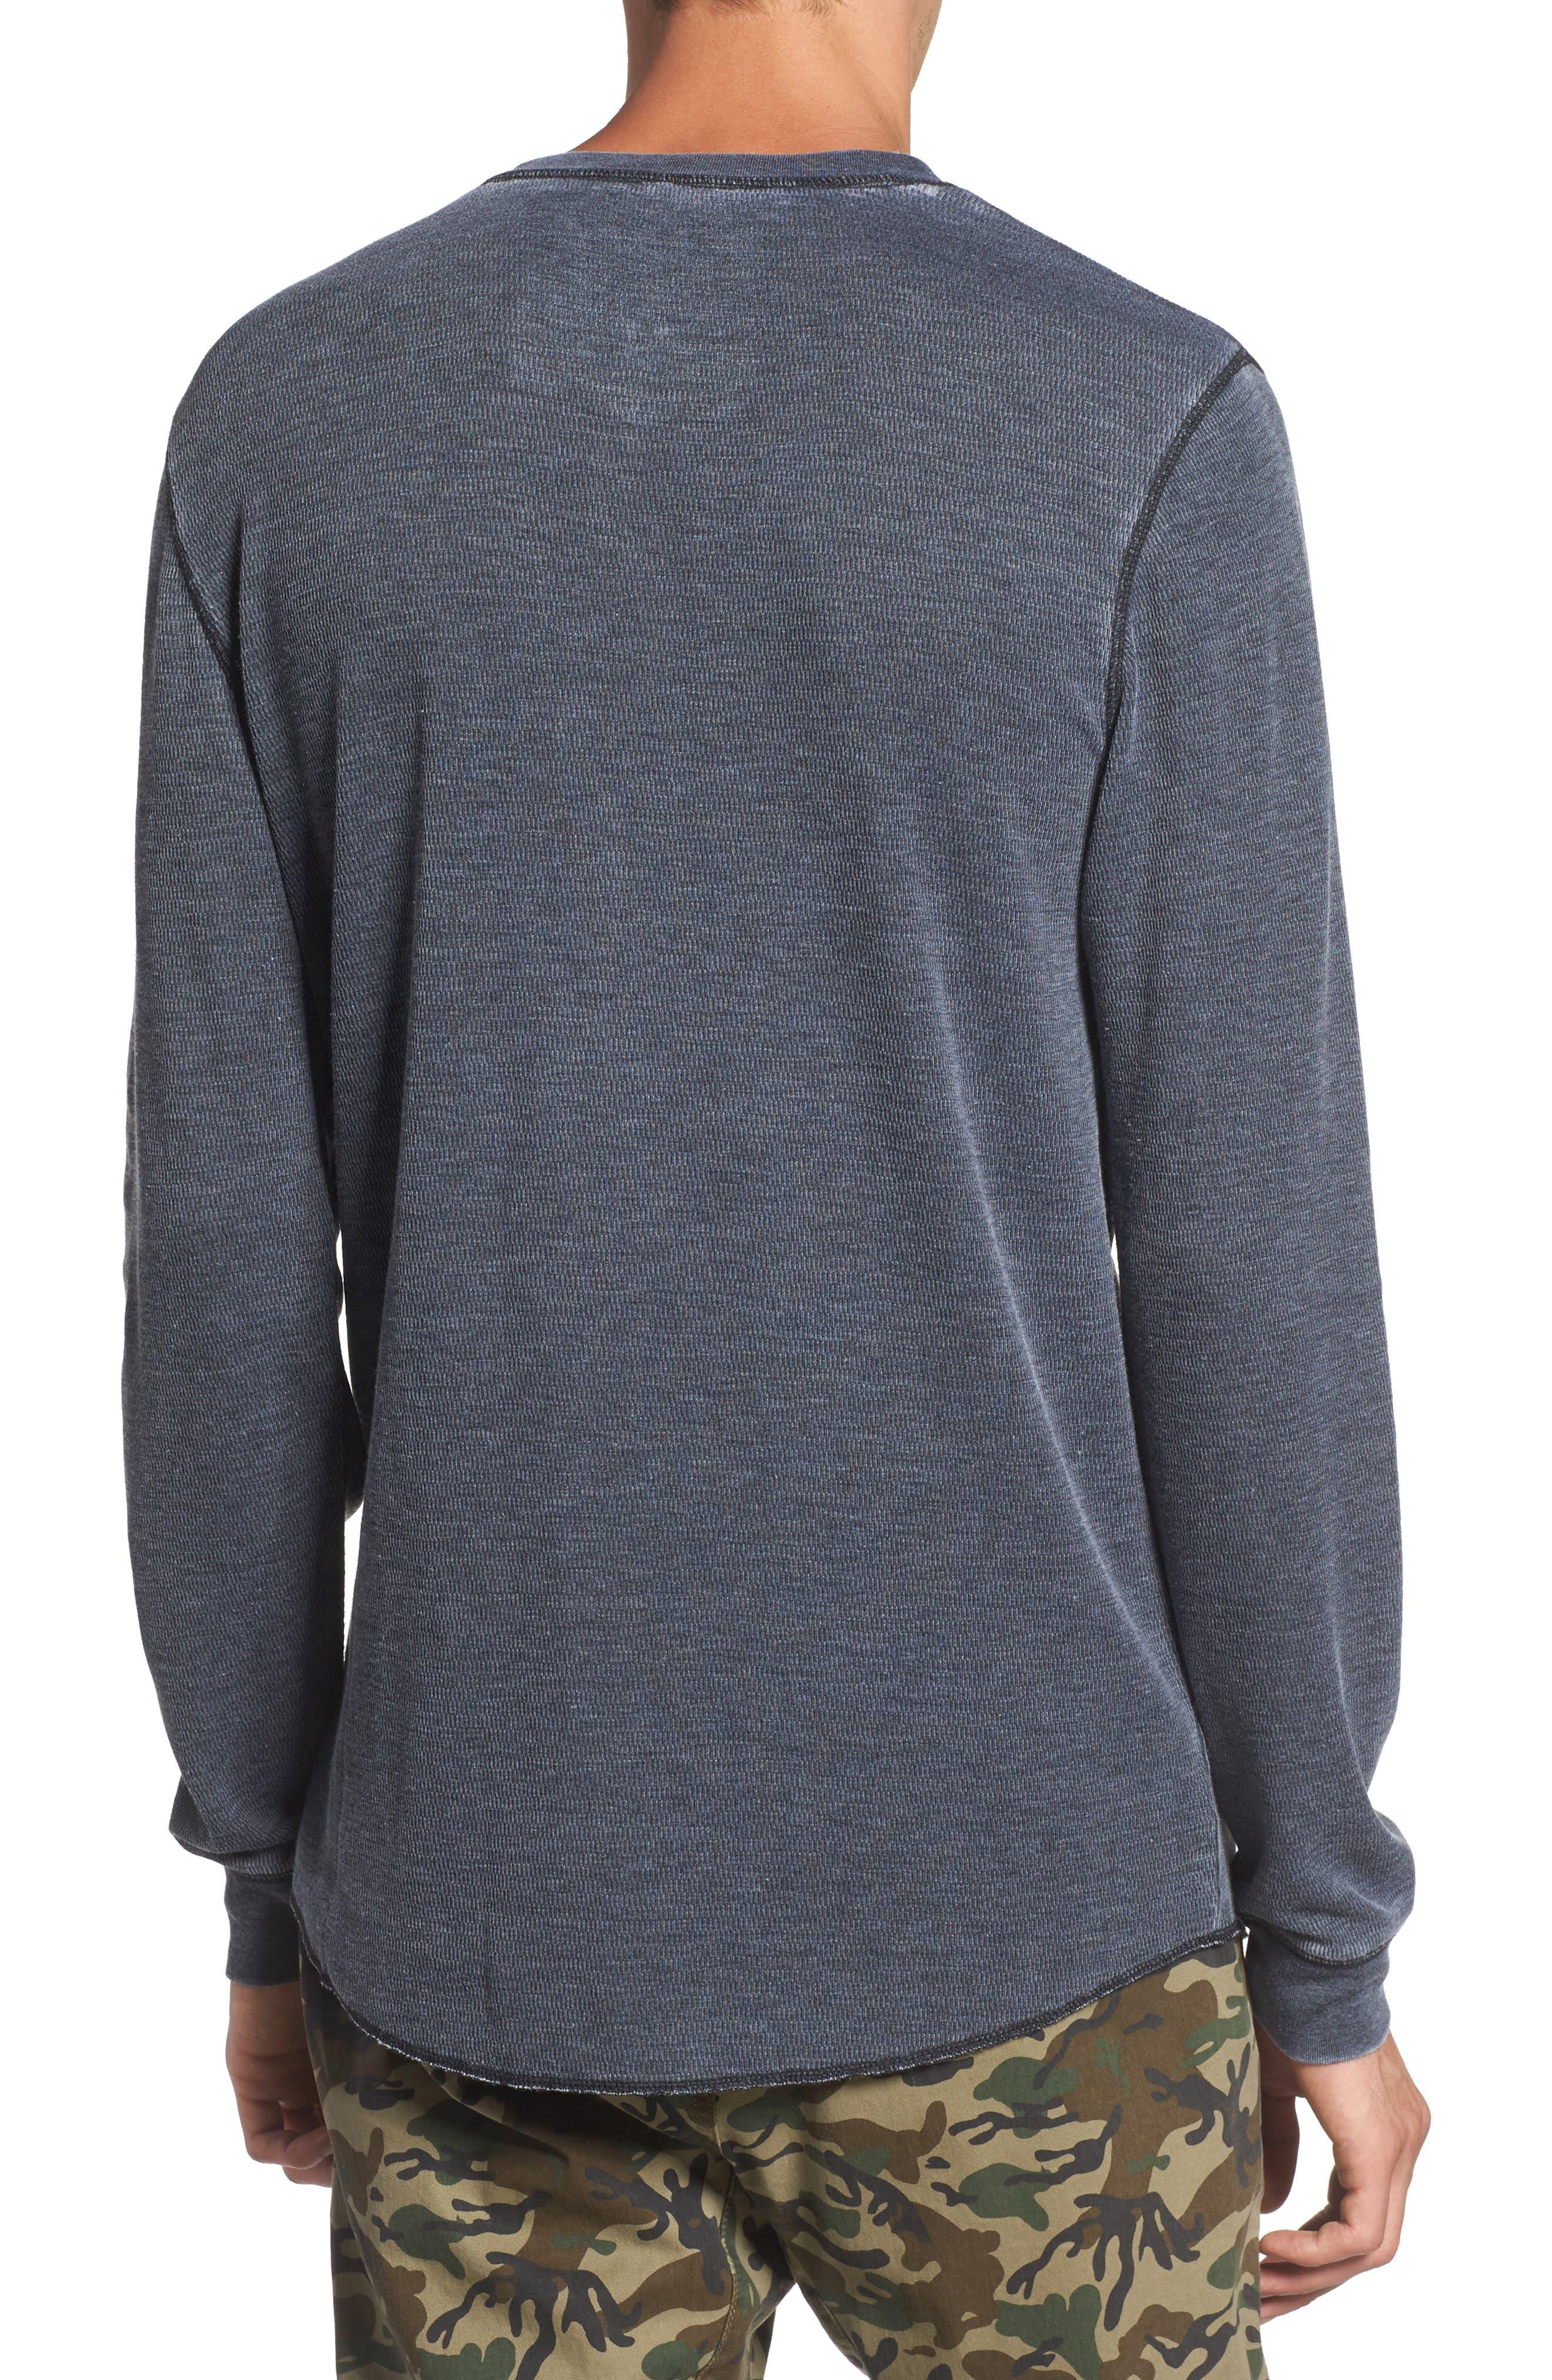 THE RAIL,                             Notch Neck Thermal T-Shirt,                             Alternate thumbnail 2, color,                             001